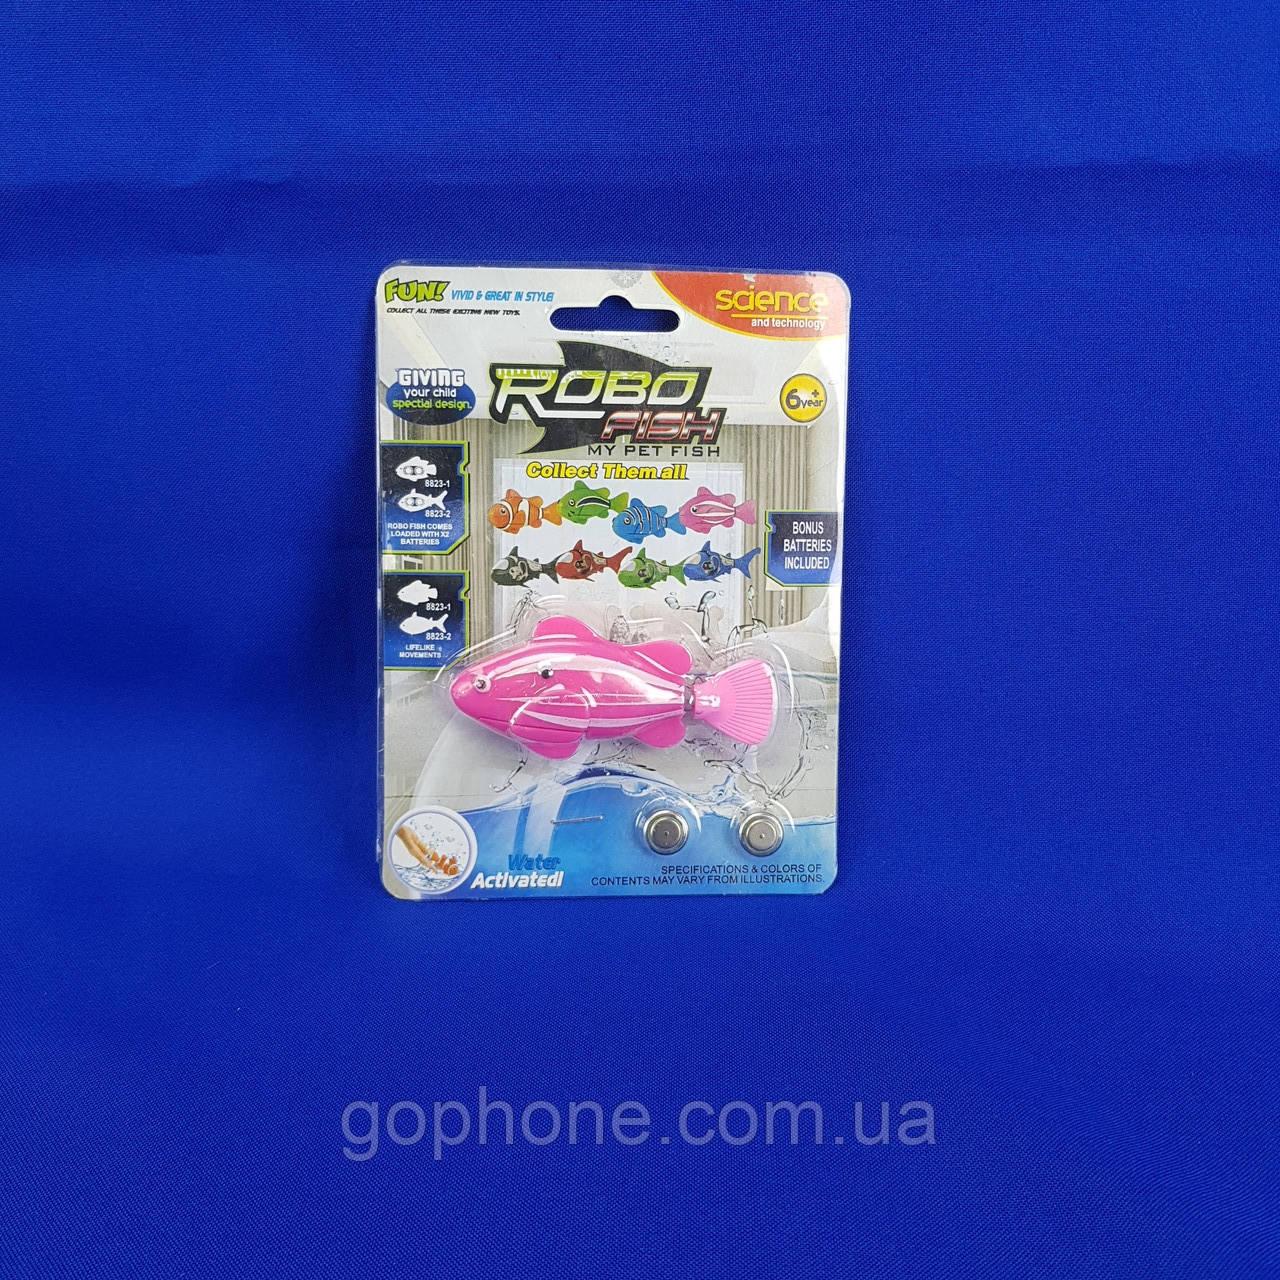 Нано - рыбка для аквариума на батарейках RoboFish (Розовая)